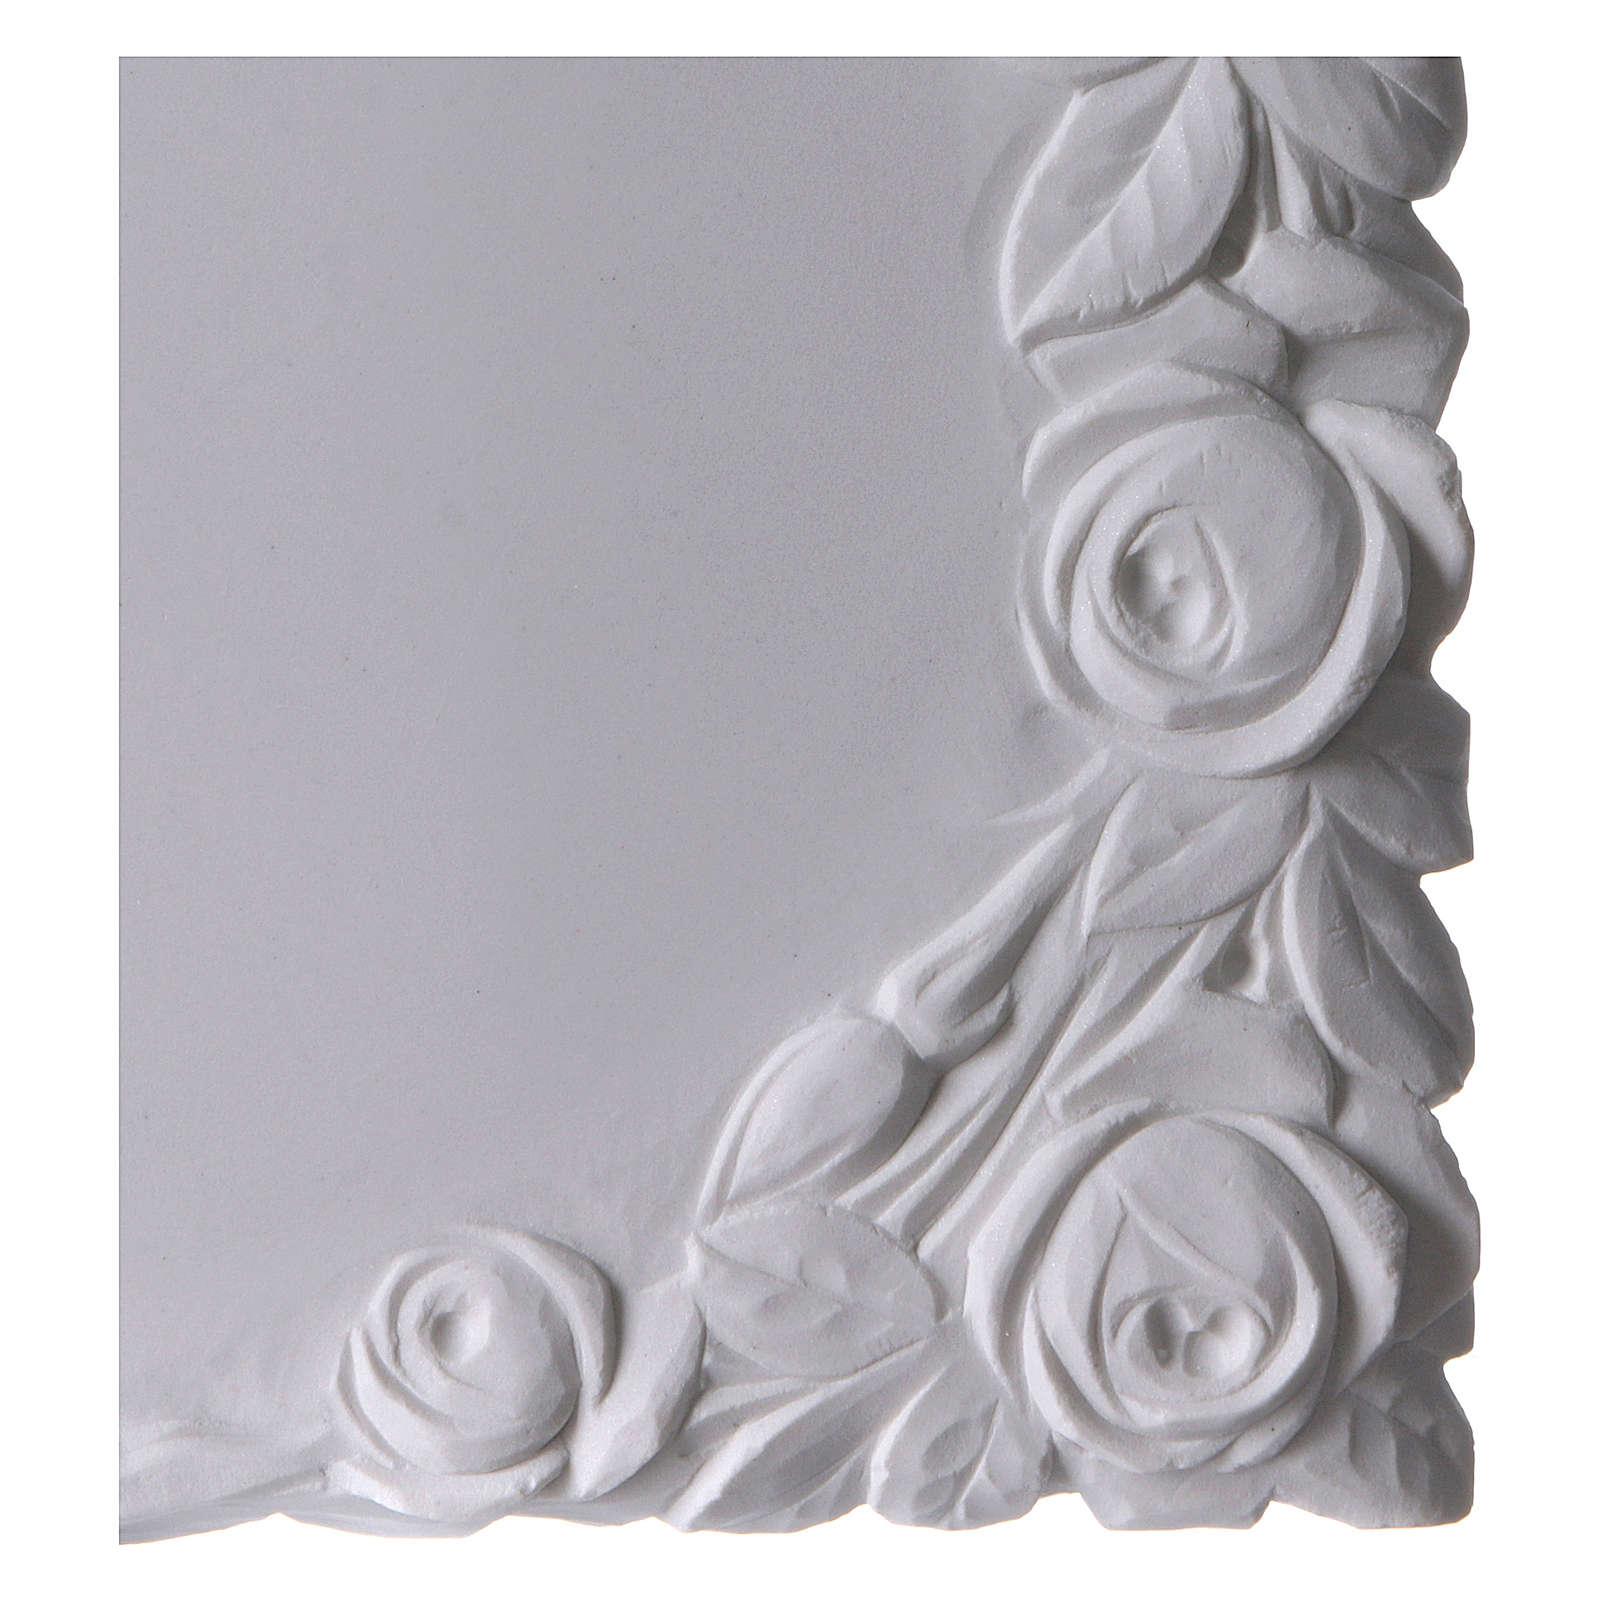 Libro targa per cimiteri marmo sintetico con rose 3